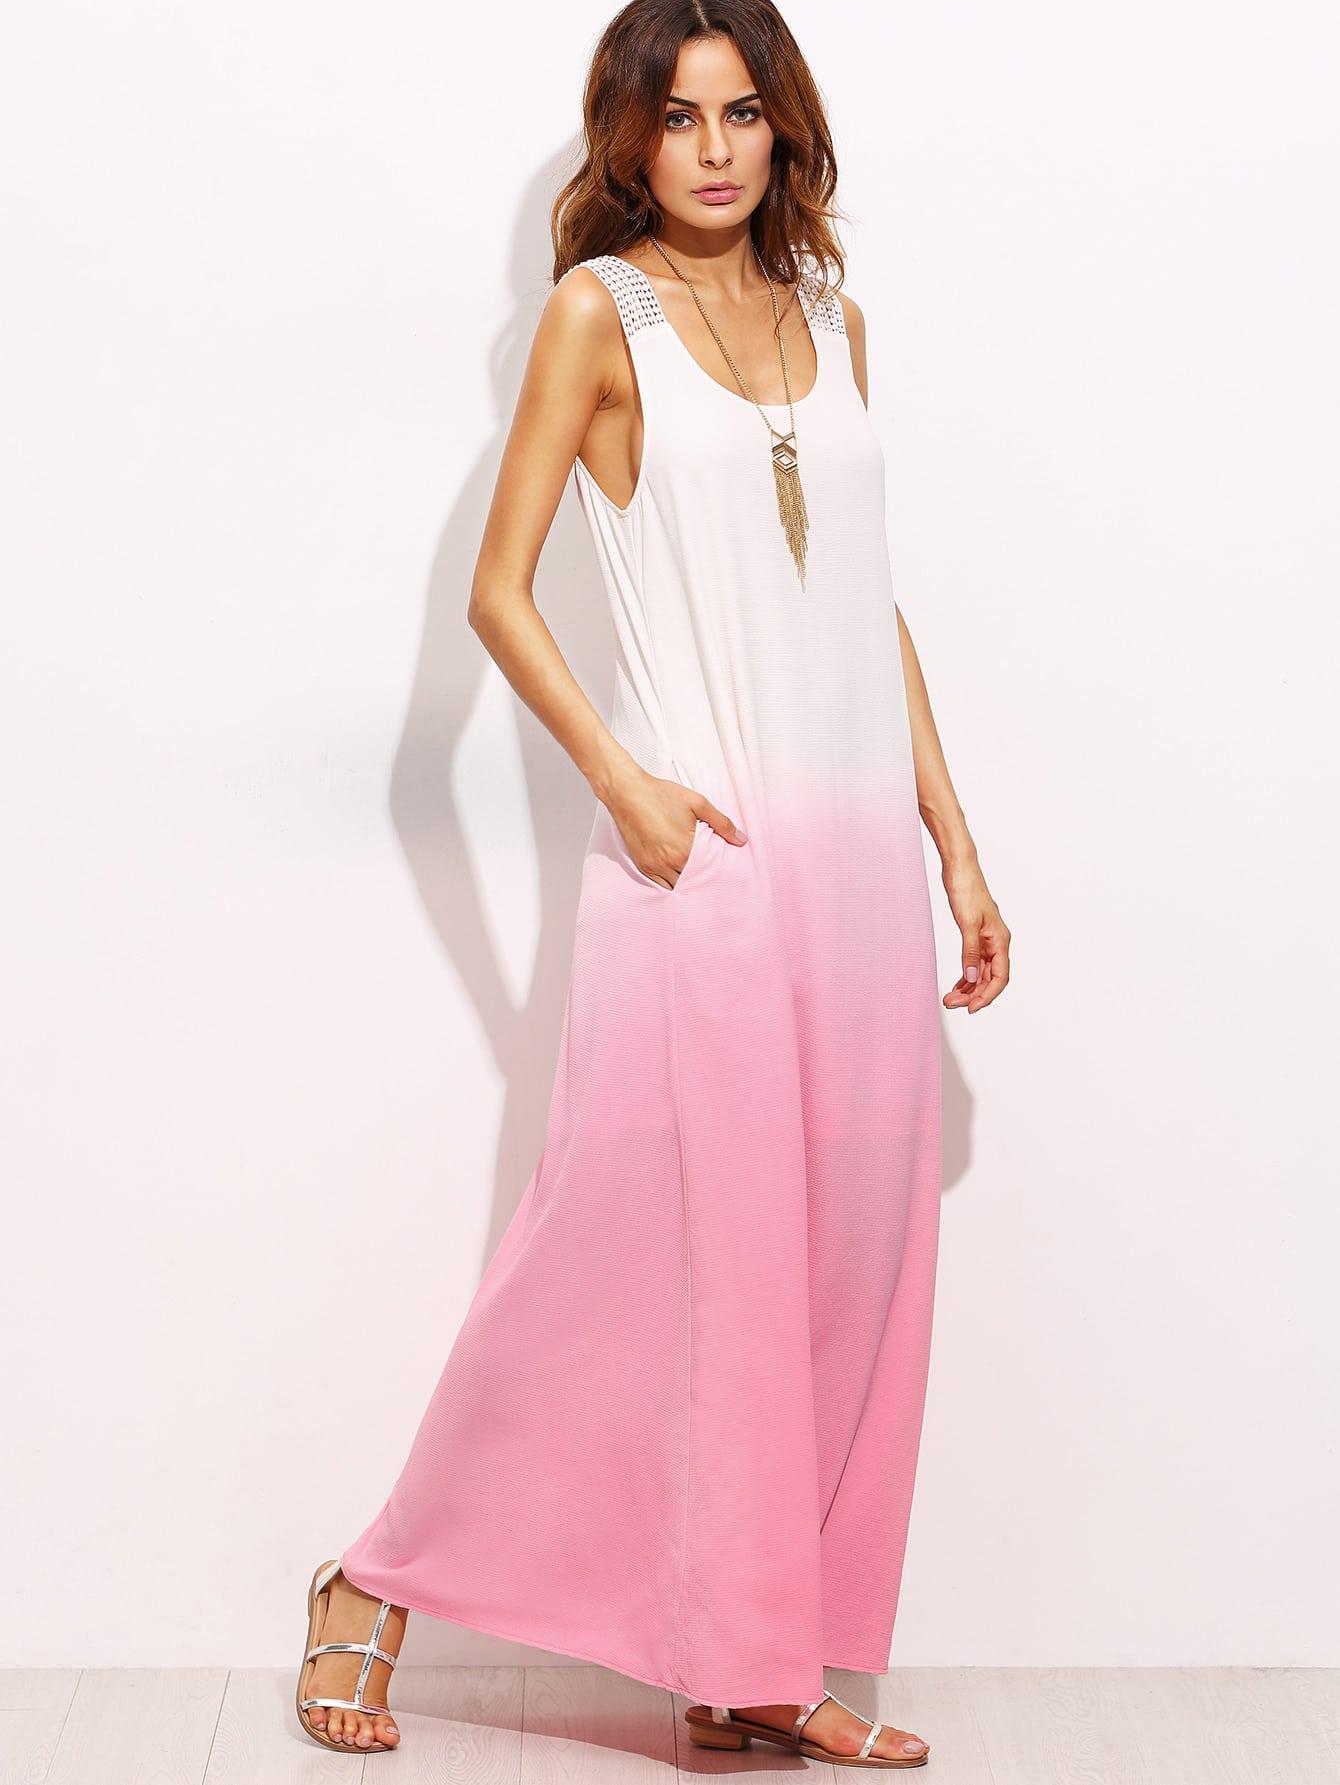 Ombre Tie Back Sleeveless Maxi DressOmbre Tie Back Sleeveless Maxi Dress<br><br>color: Ombre<br>size: XS